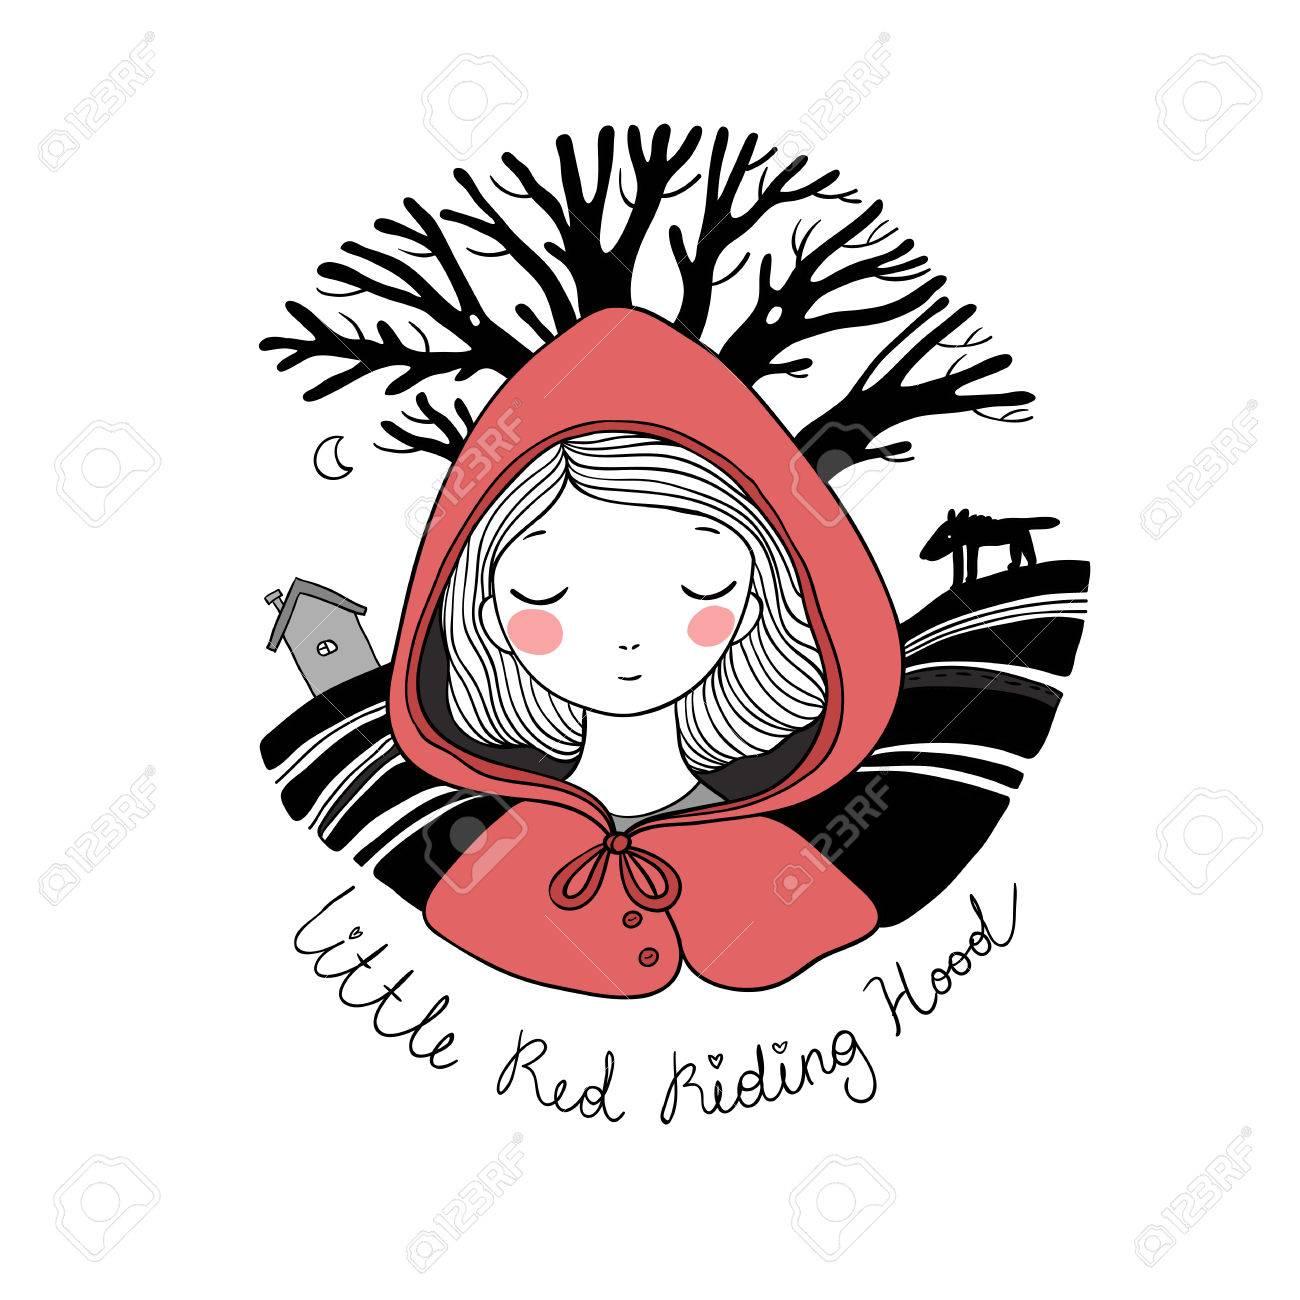 A cute little girl. Red Riding Hood fairy tale. - 80559721